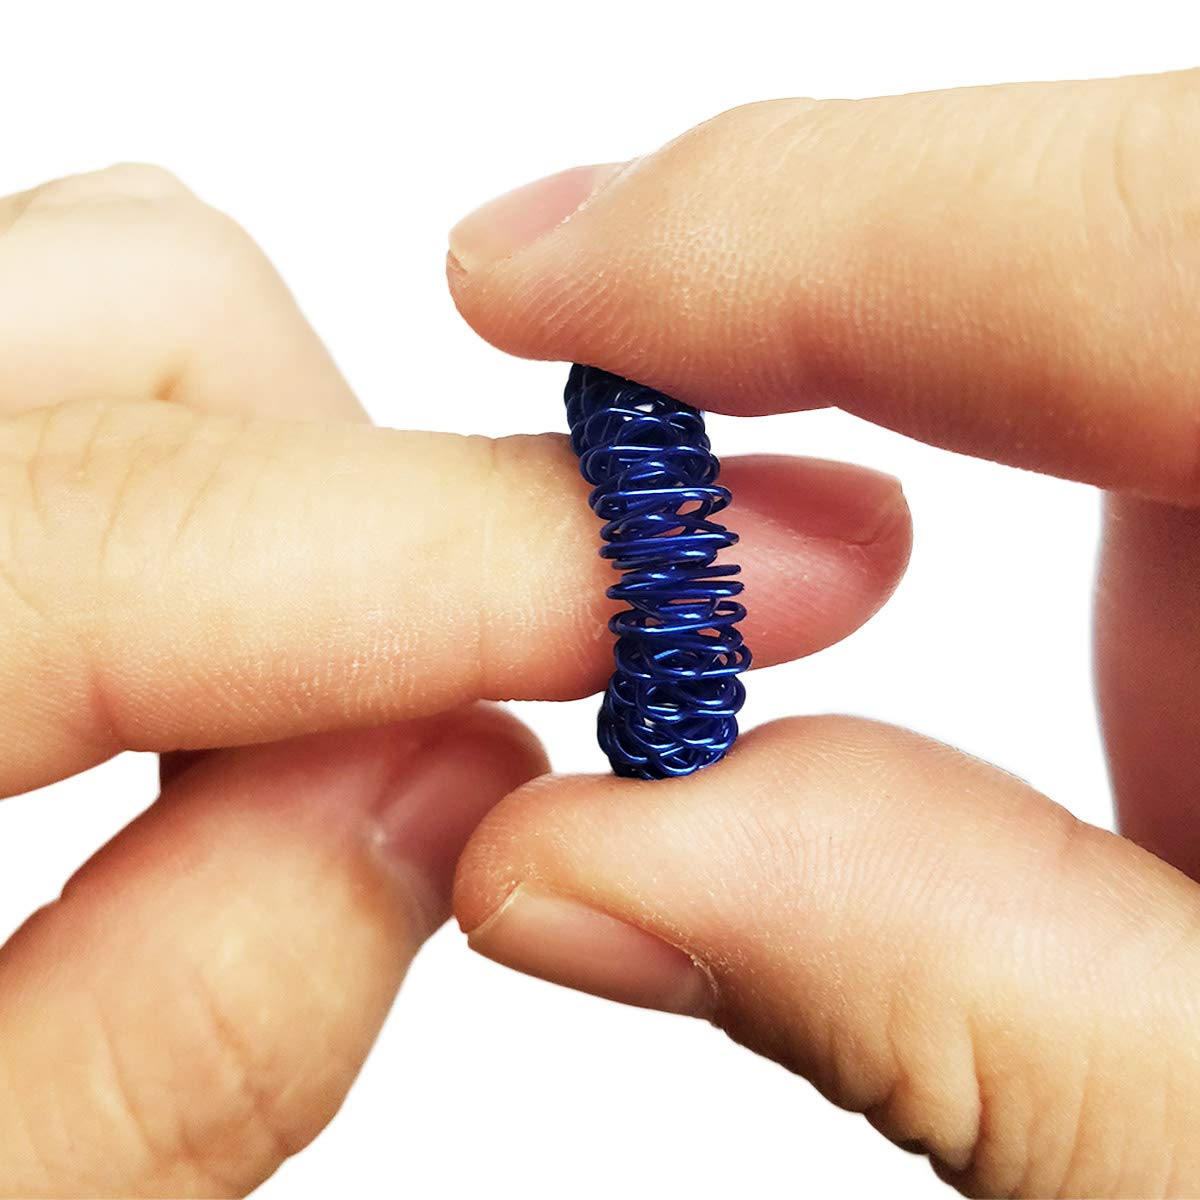 ,Kids Teens /& Adults Silent Stress Reducer /& Massager for Fidget ADD ADHD OCD Autism Pack of 12 Stress Relief Fidget Sensory Toys Spiky Sensory Finger Rings Sensory Toys